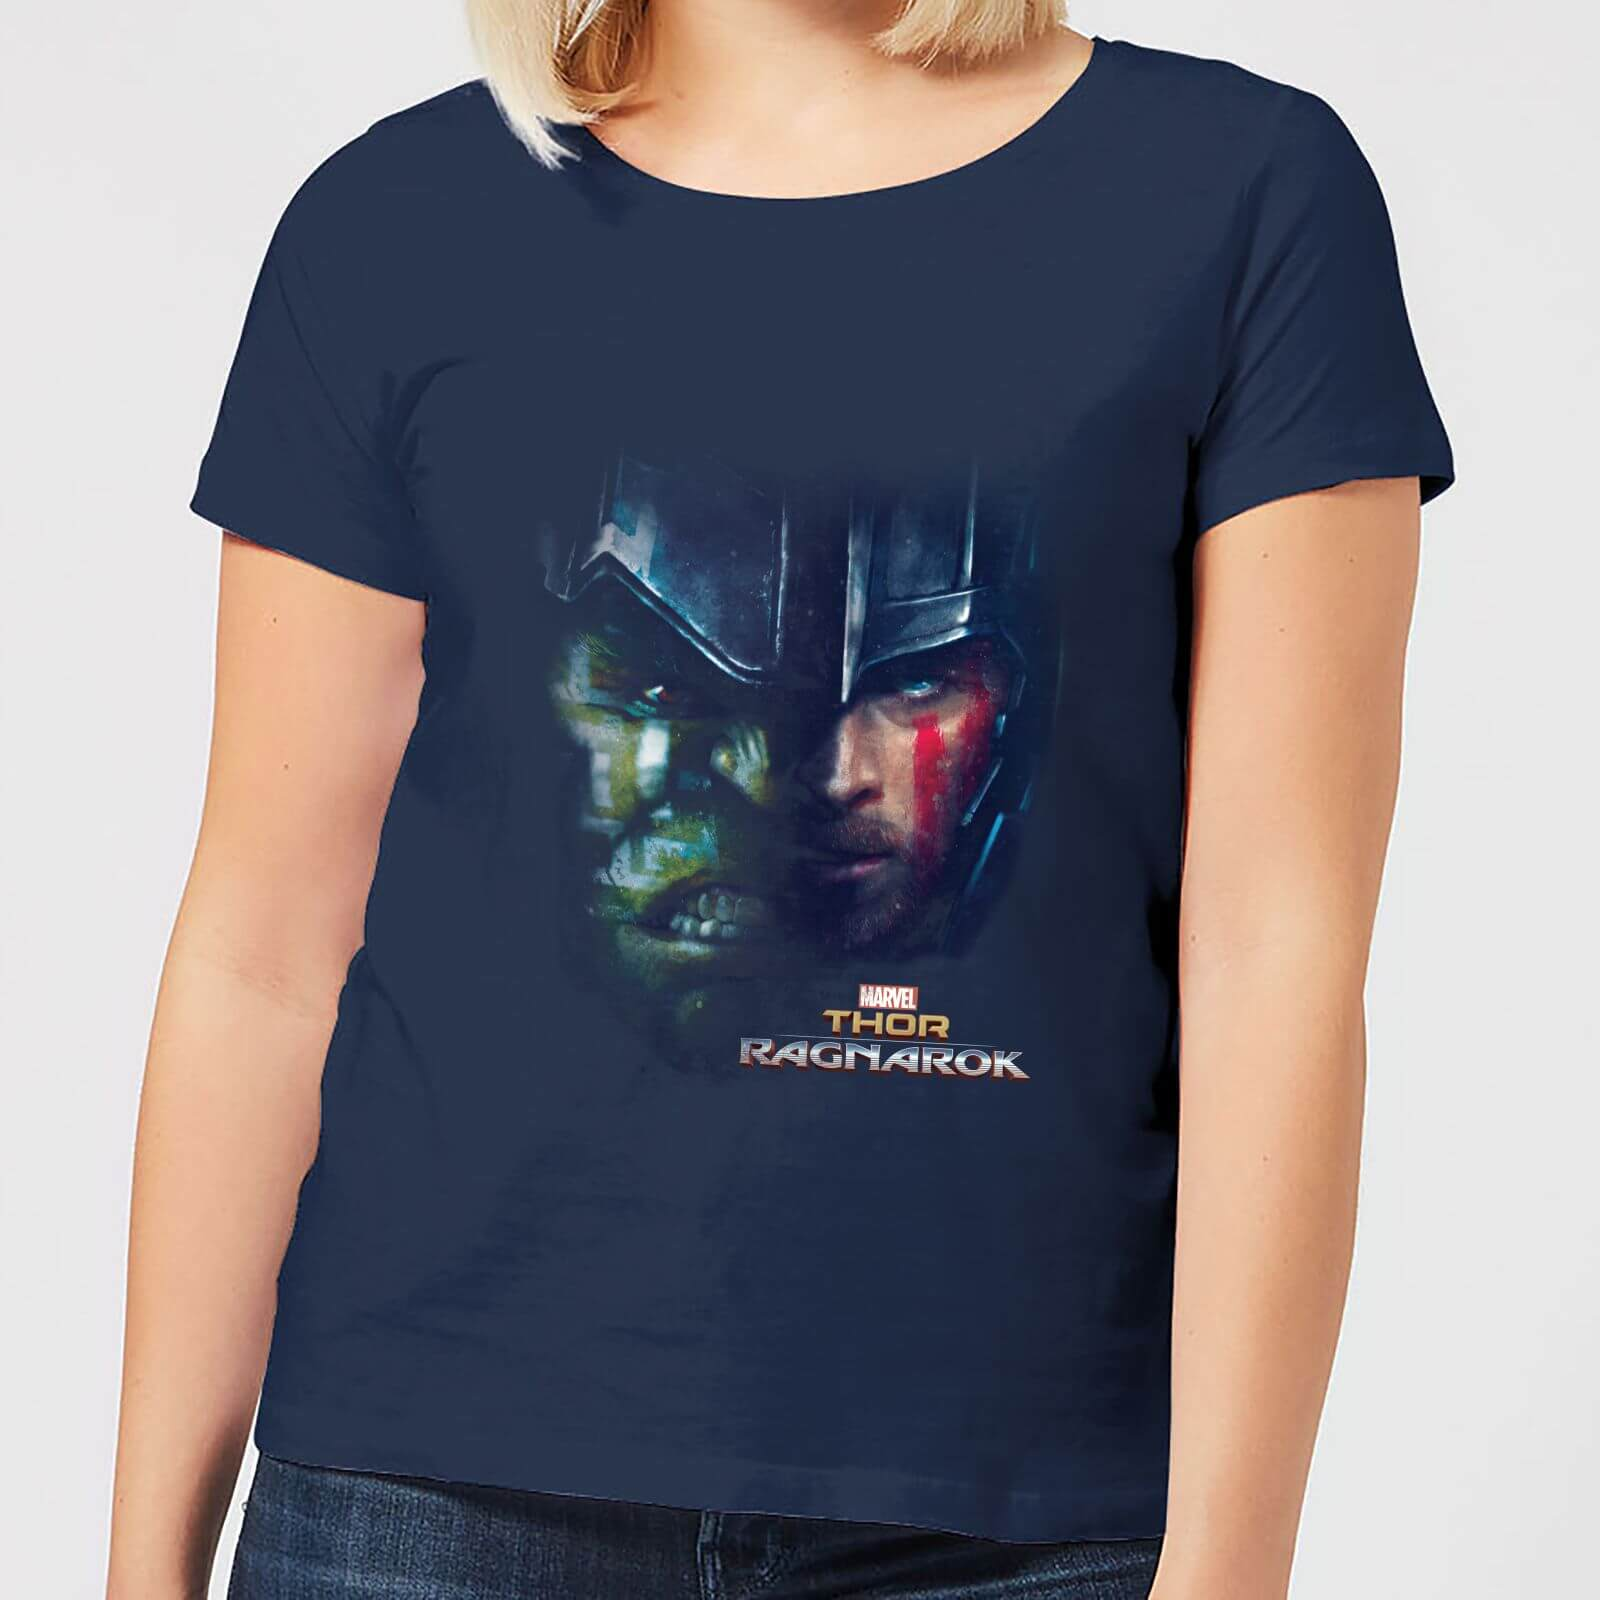 OfferteWeb.click 16-t-shirt-marvel-thor-ragnarok-hulk-split-face-navy-donna